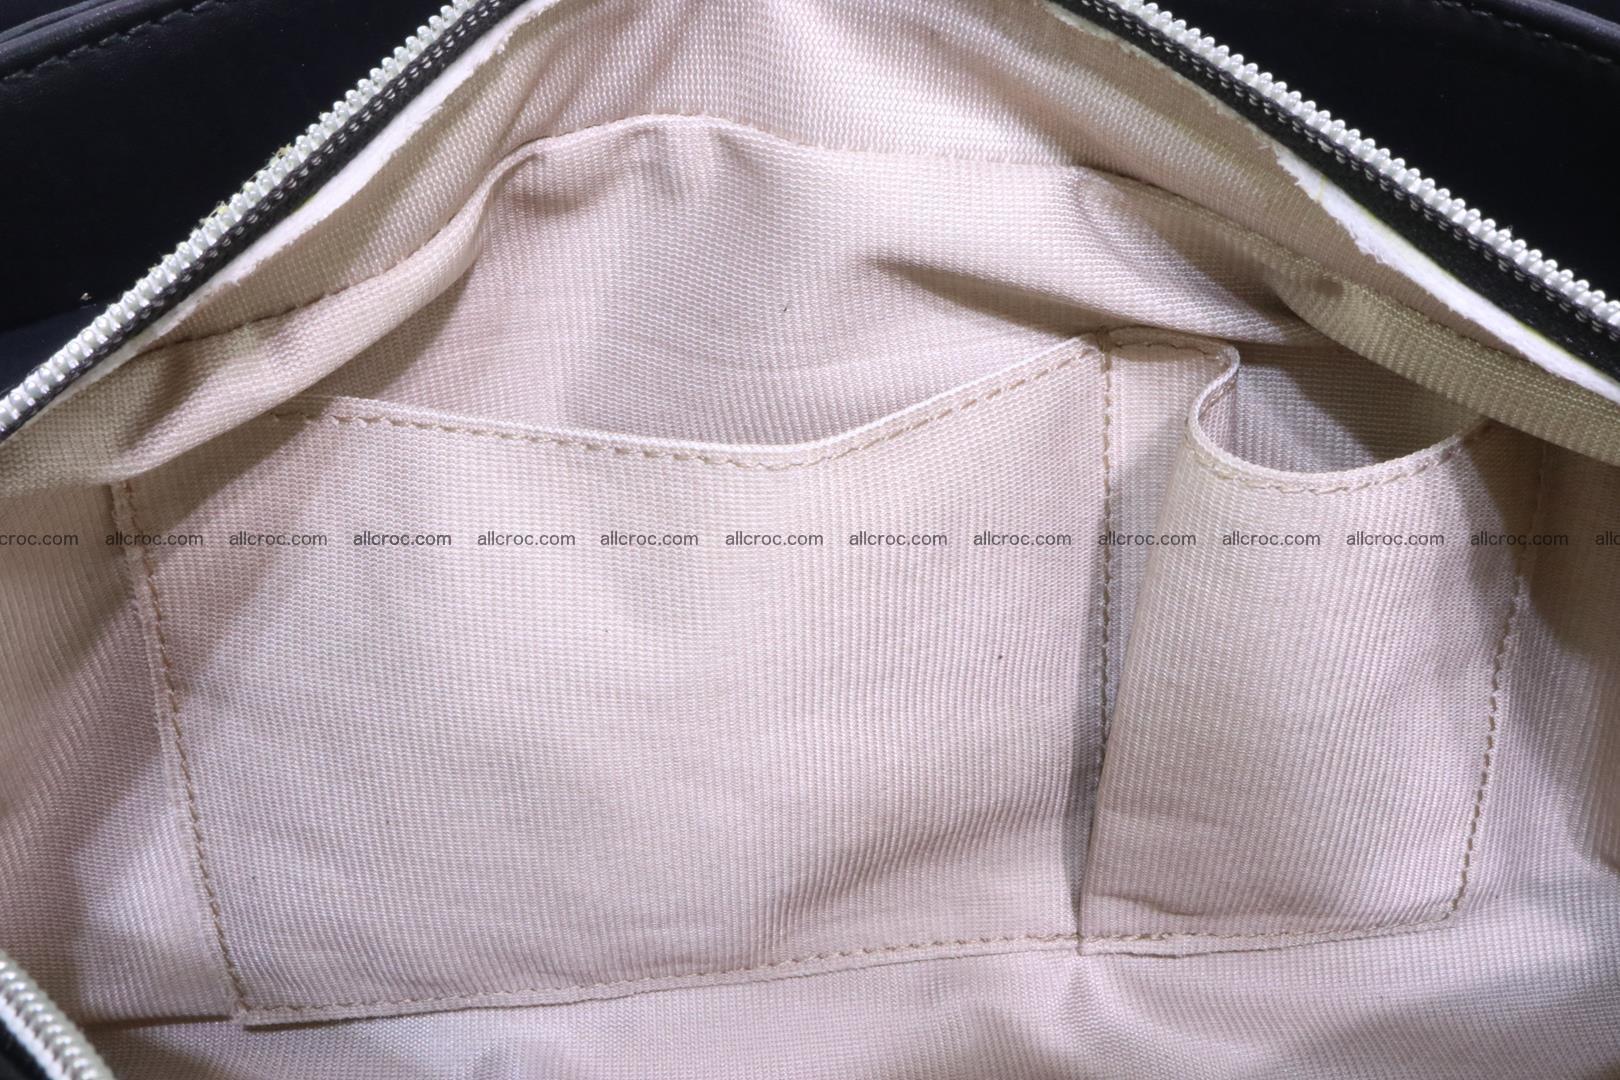 Python skin ladies handbag 221 Foto 12